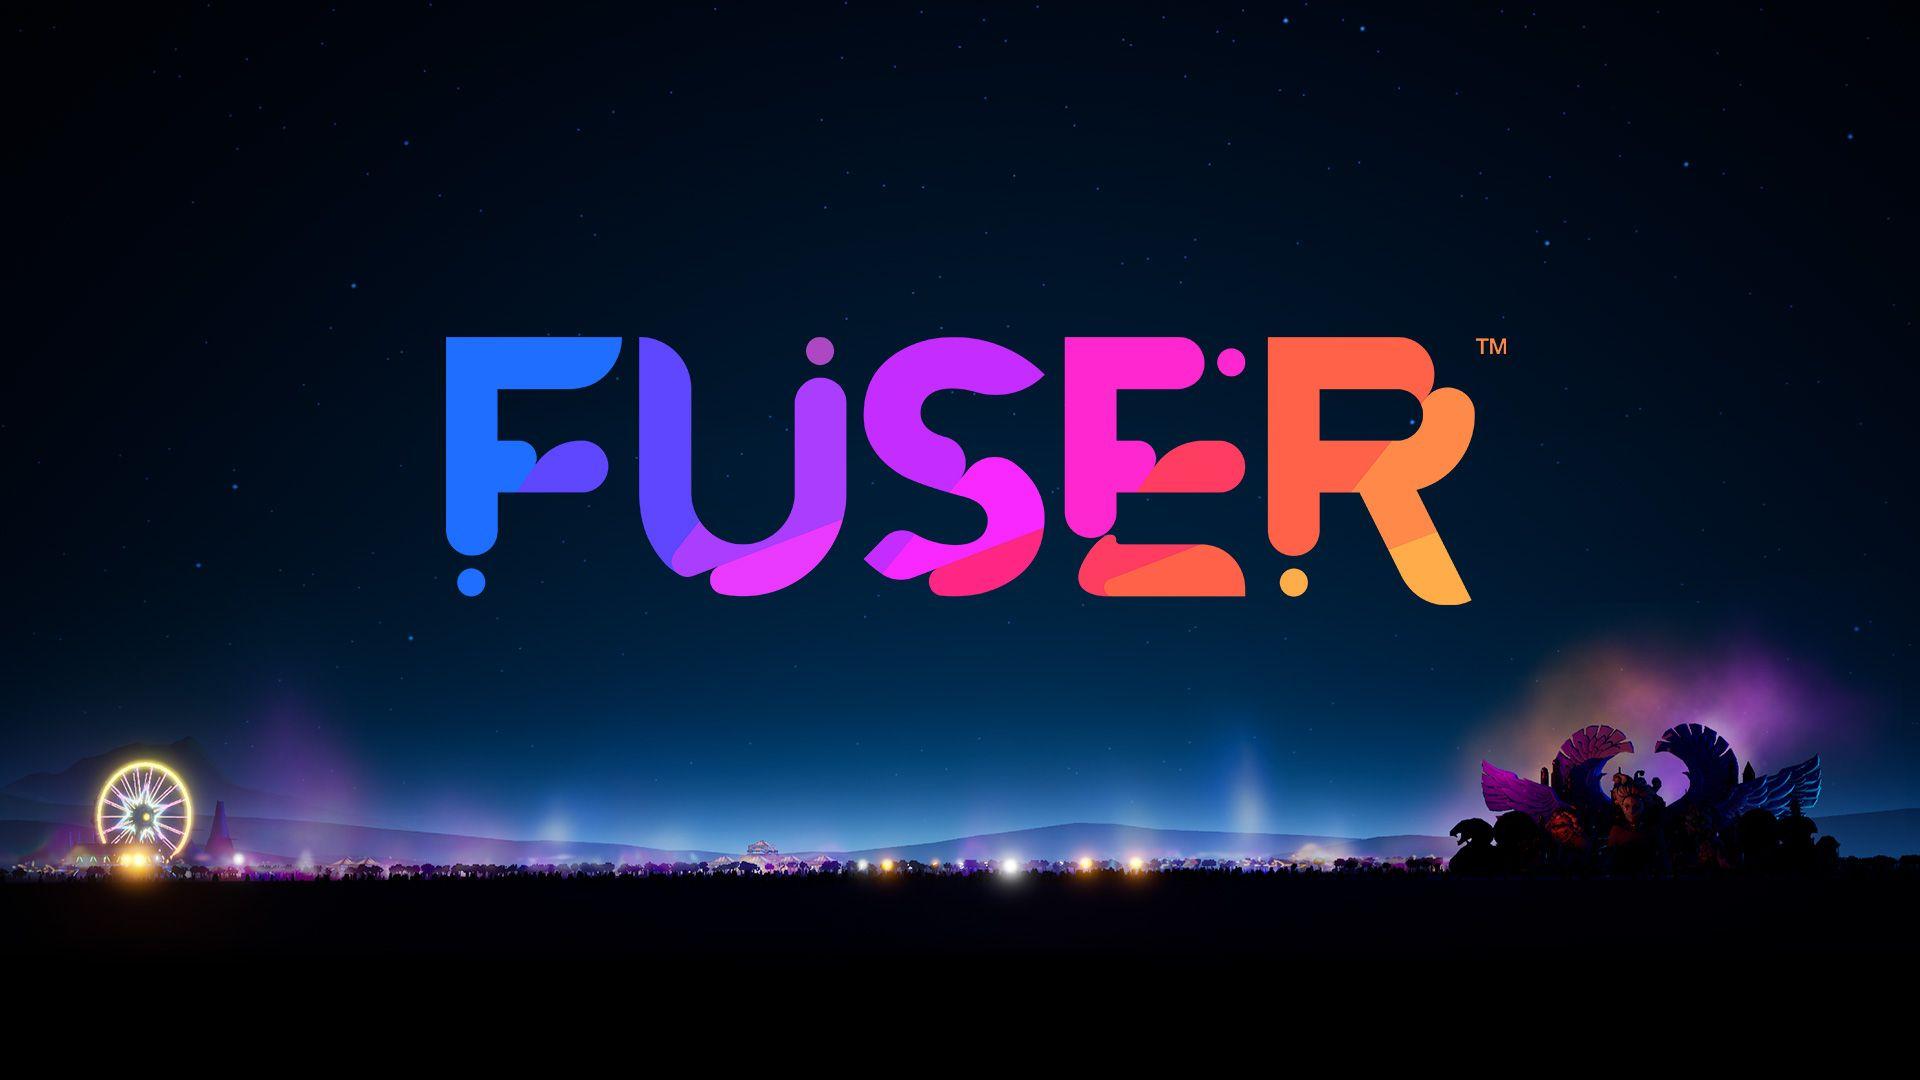 fuser logo wallpaper 72551